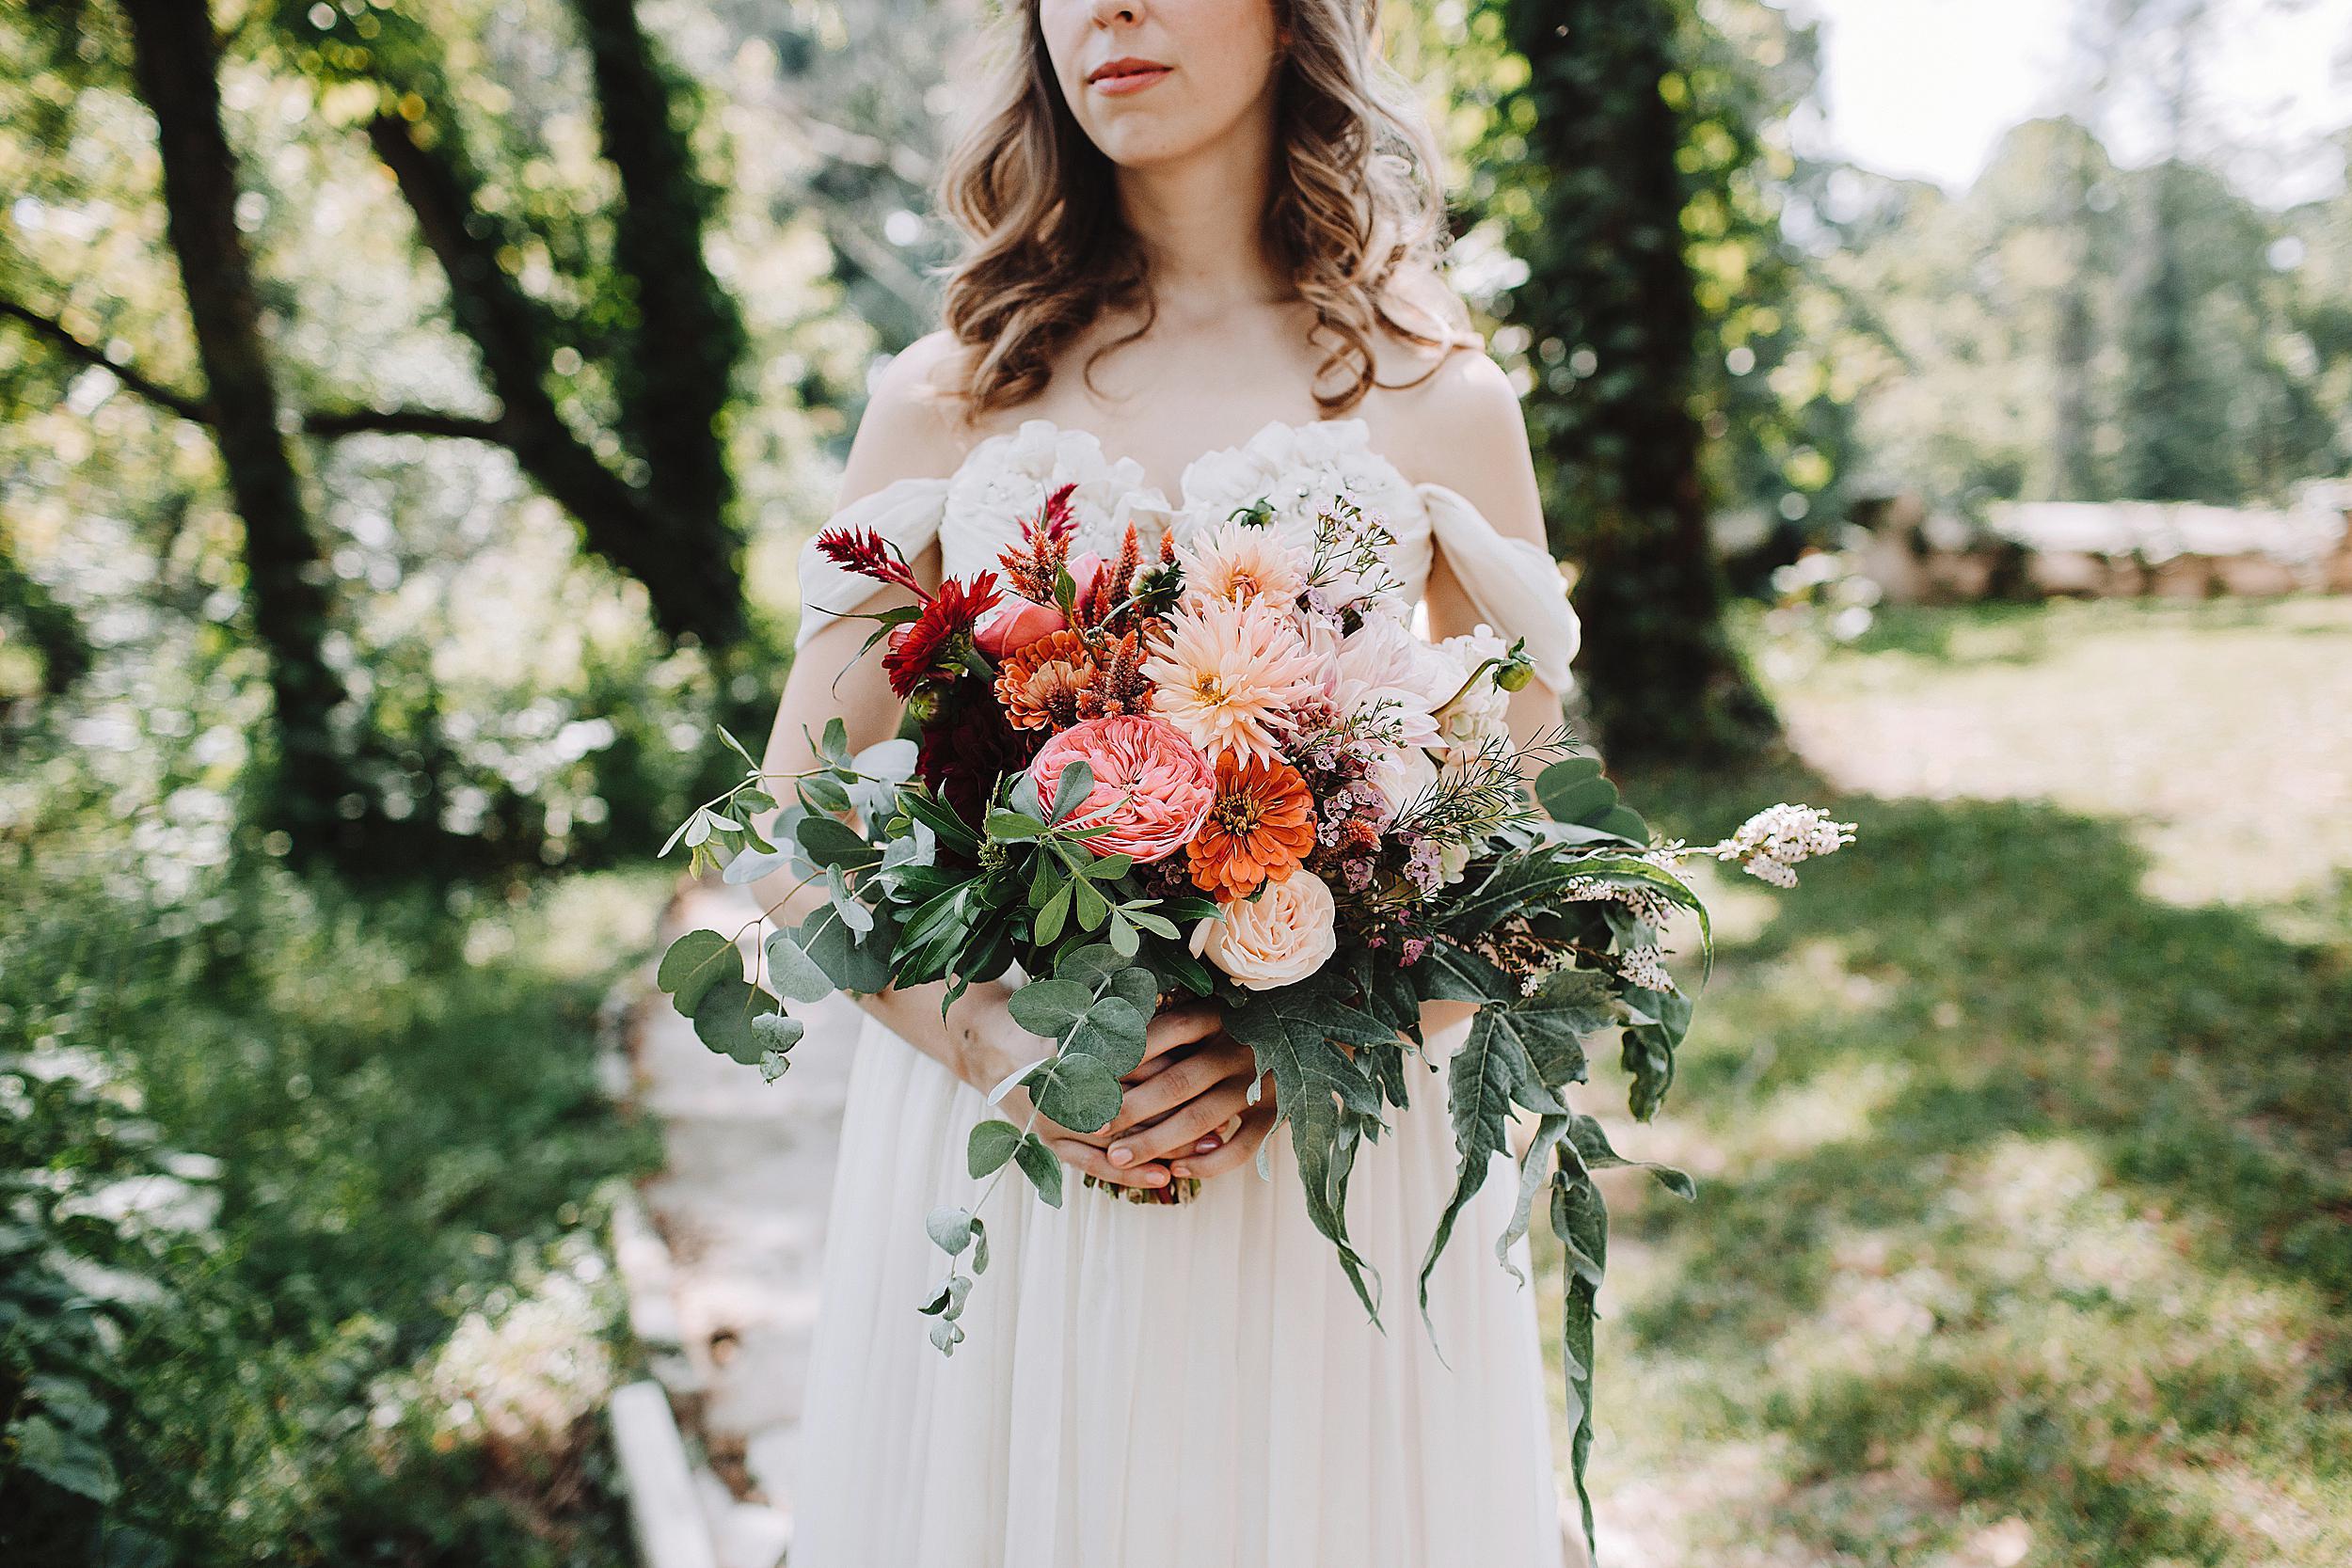 historic_shady_lane_wedding_with_love_and_embers-006.JPG